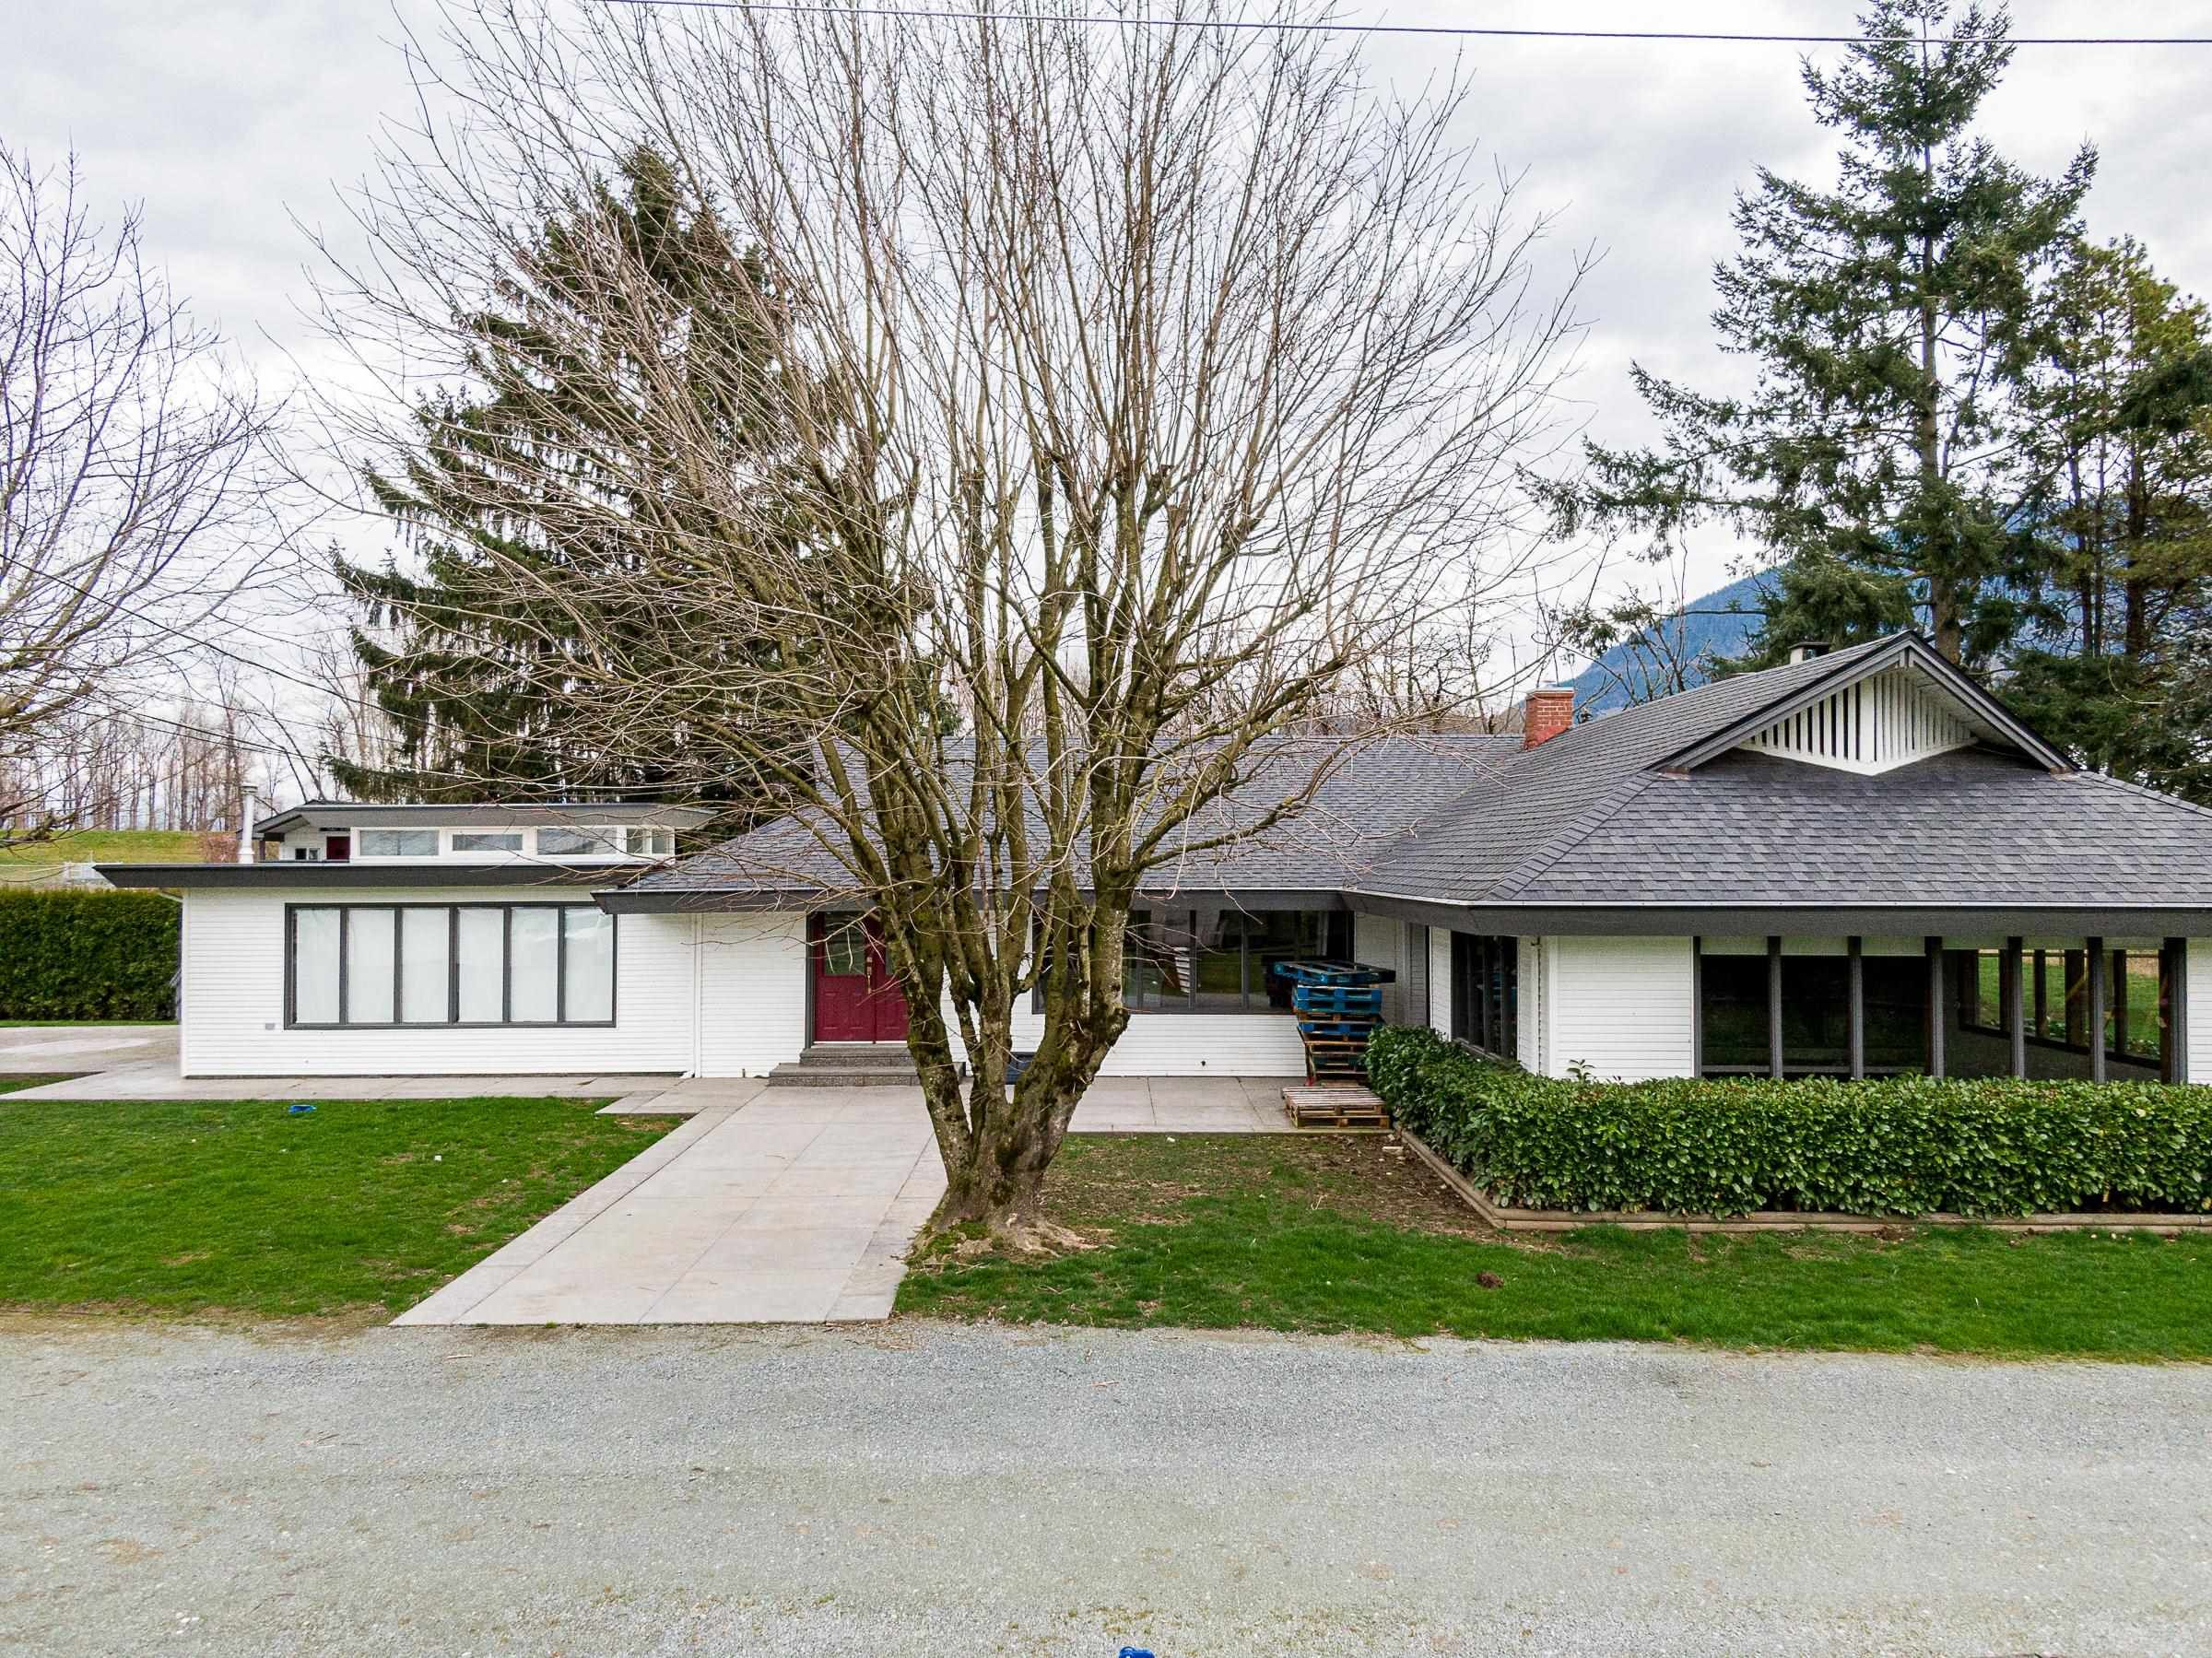 Main Photo: 41745 NO. 3 Road: Yarrow House for sale : MLS®# R2614265